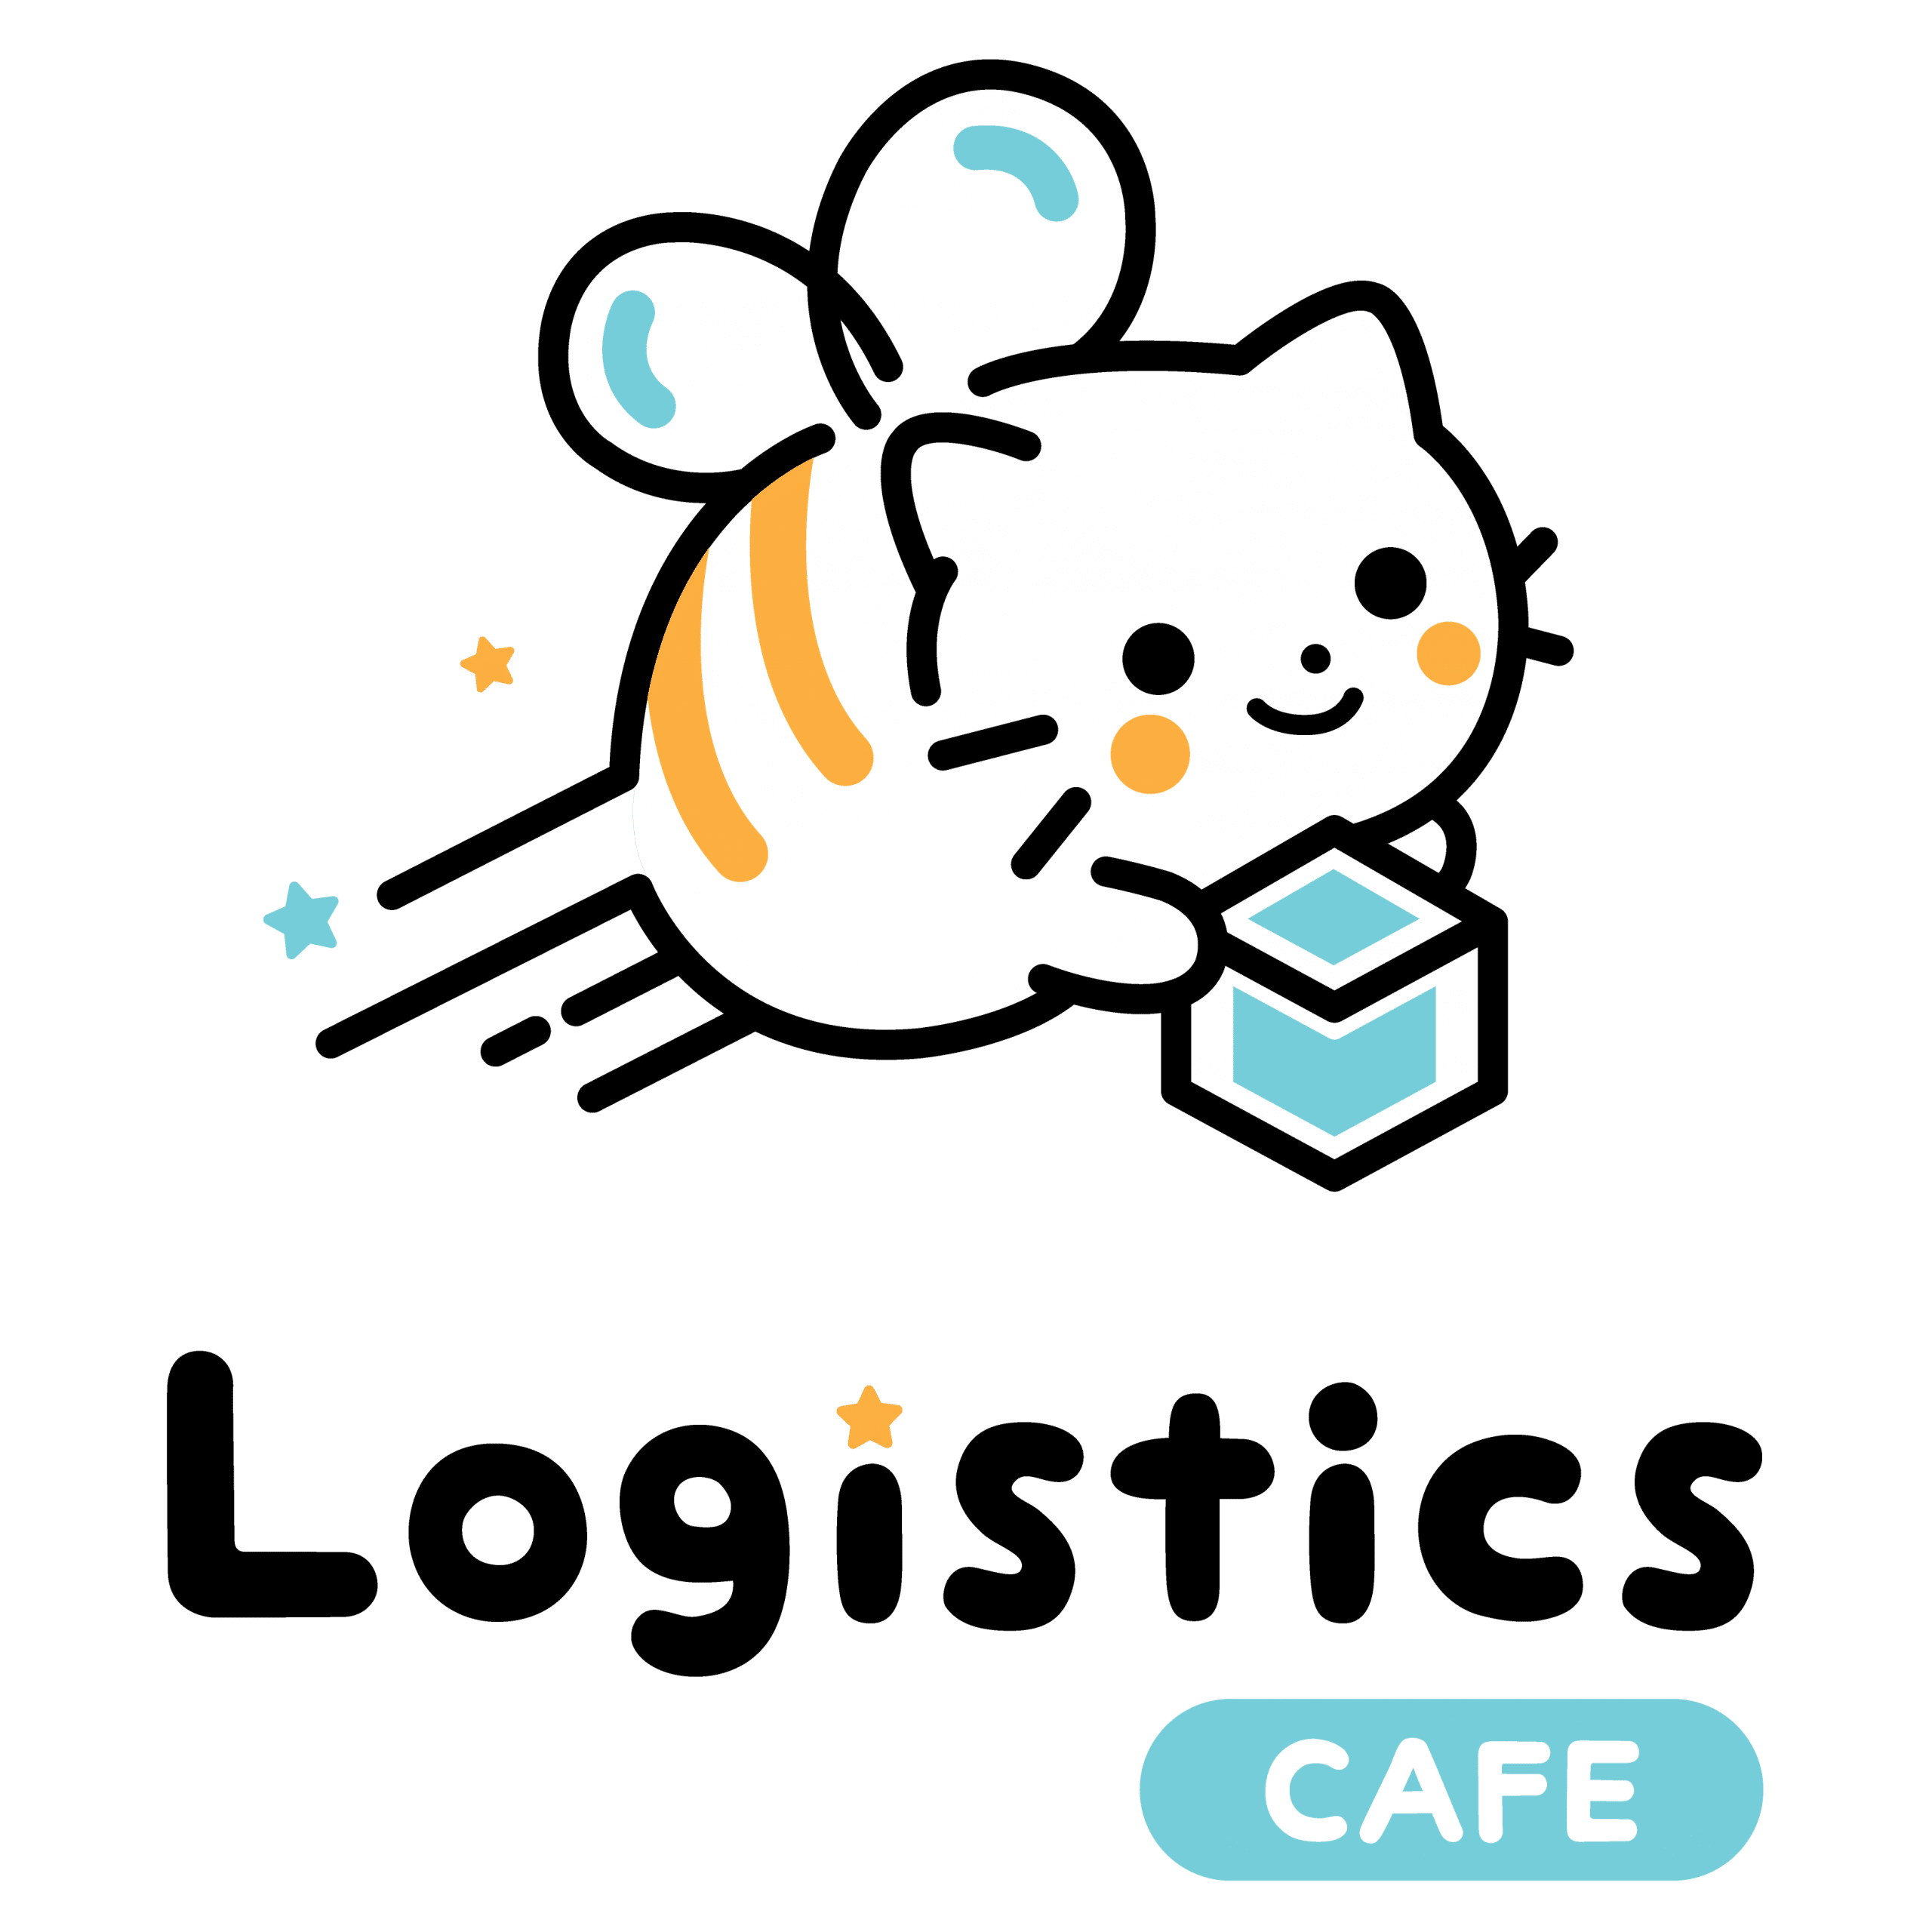 logistiCafe.com ความรู้พื้นฐานโลจิสติกส์และซัพพลายเชน